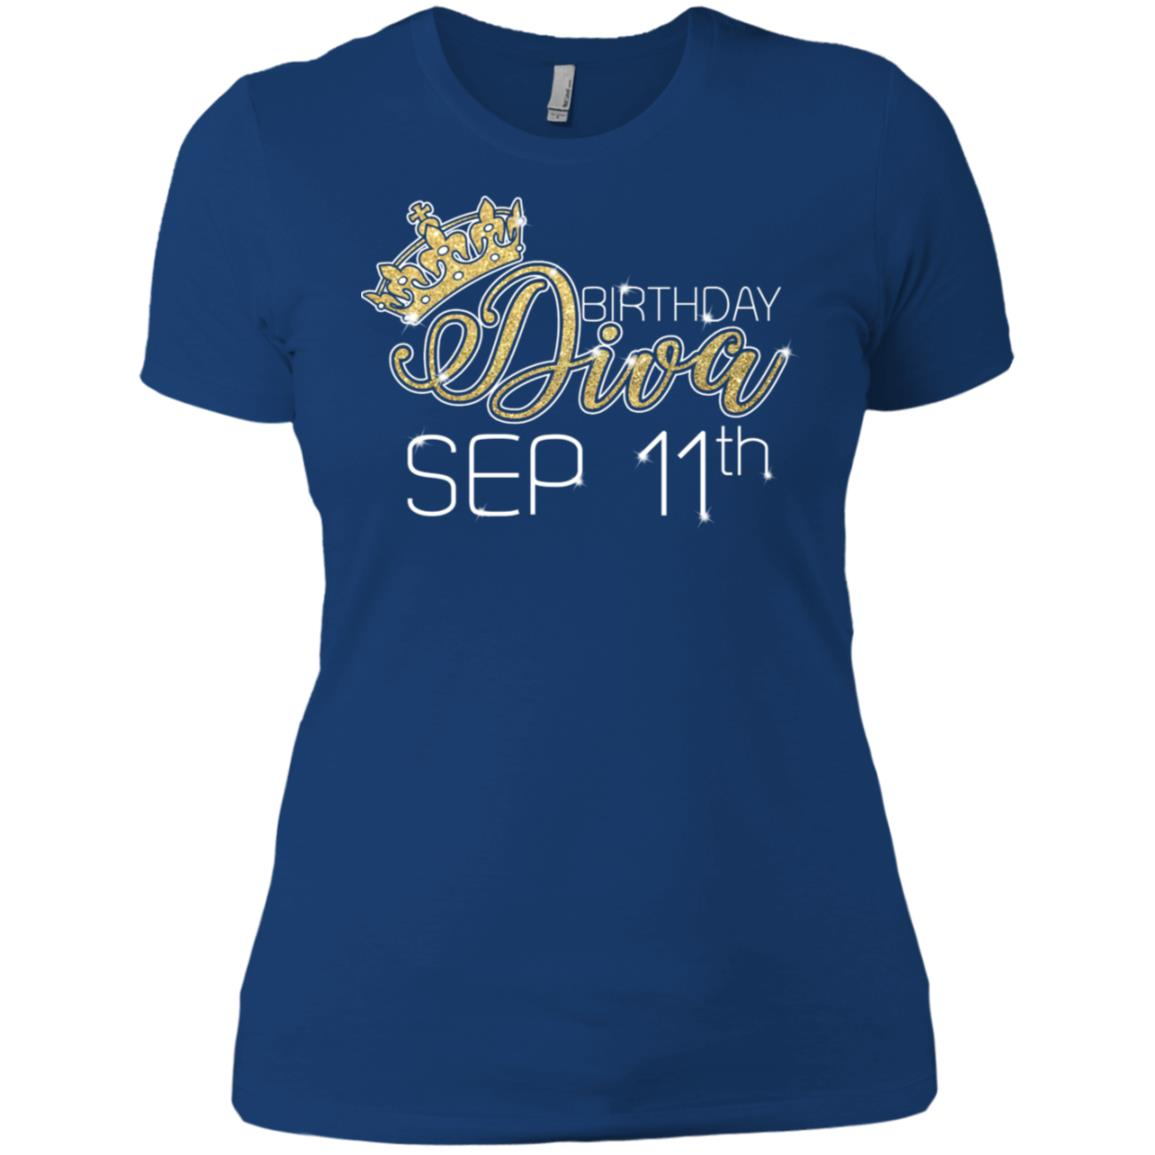 Birthday Diva on September 11th Virgo Pr Women Short Sleeve